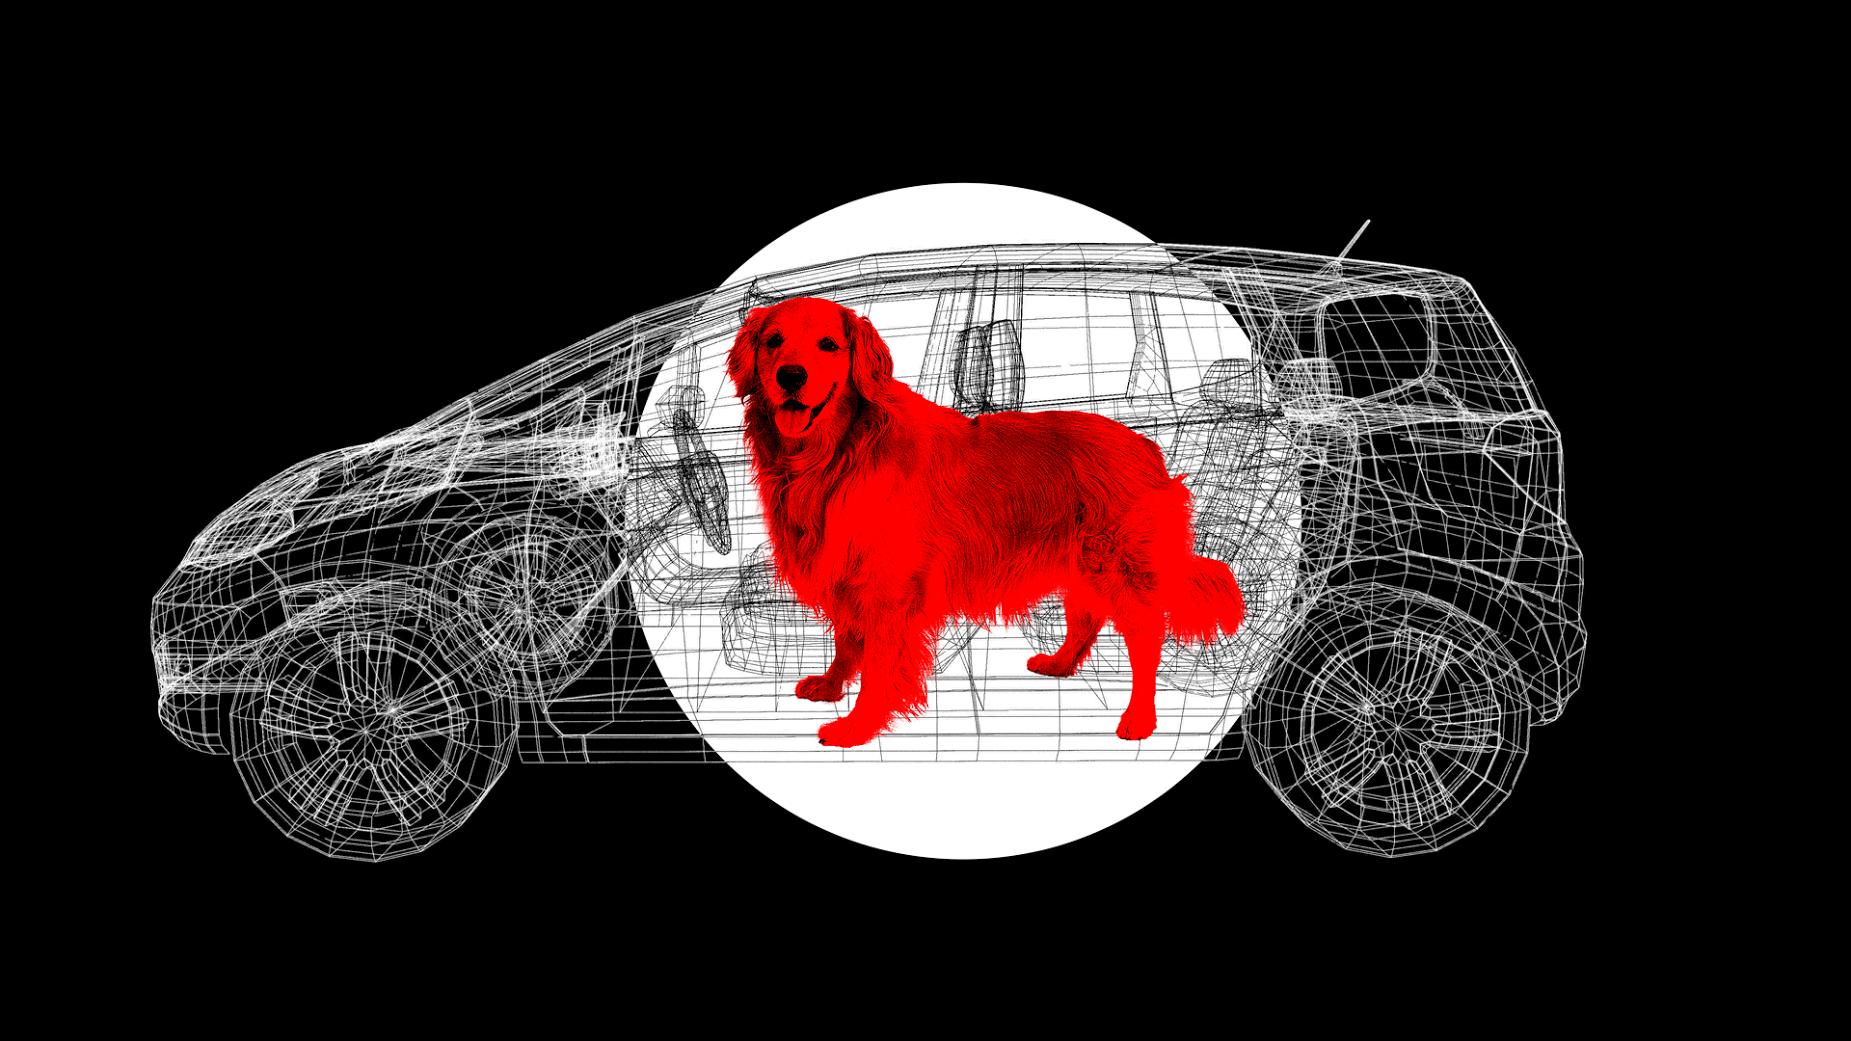 mimze9jkogqdu28h15kl you aren't doing enough to keep your pet safe in the car